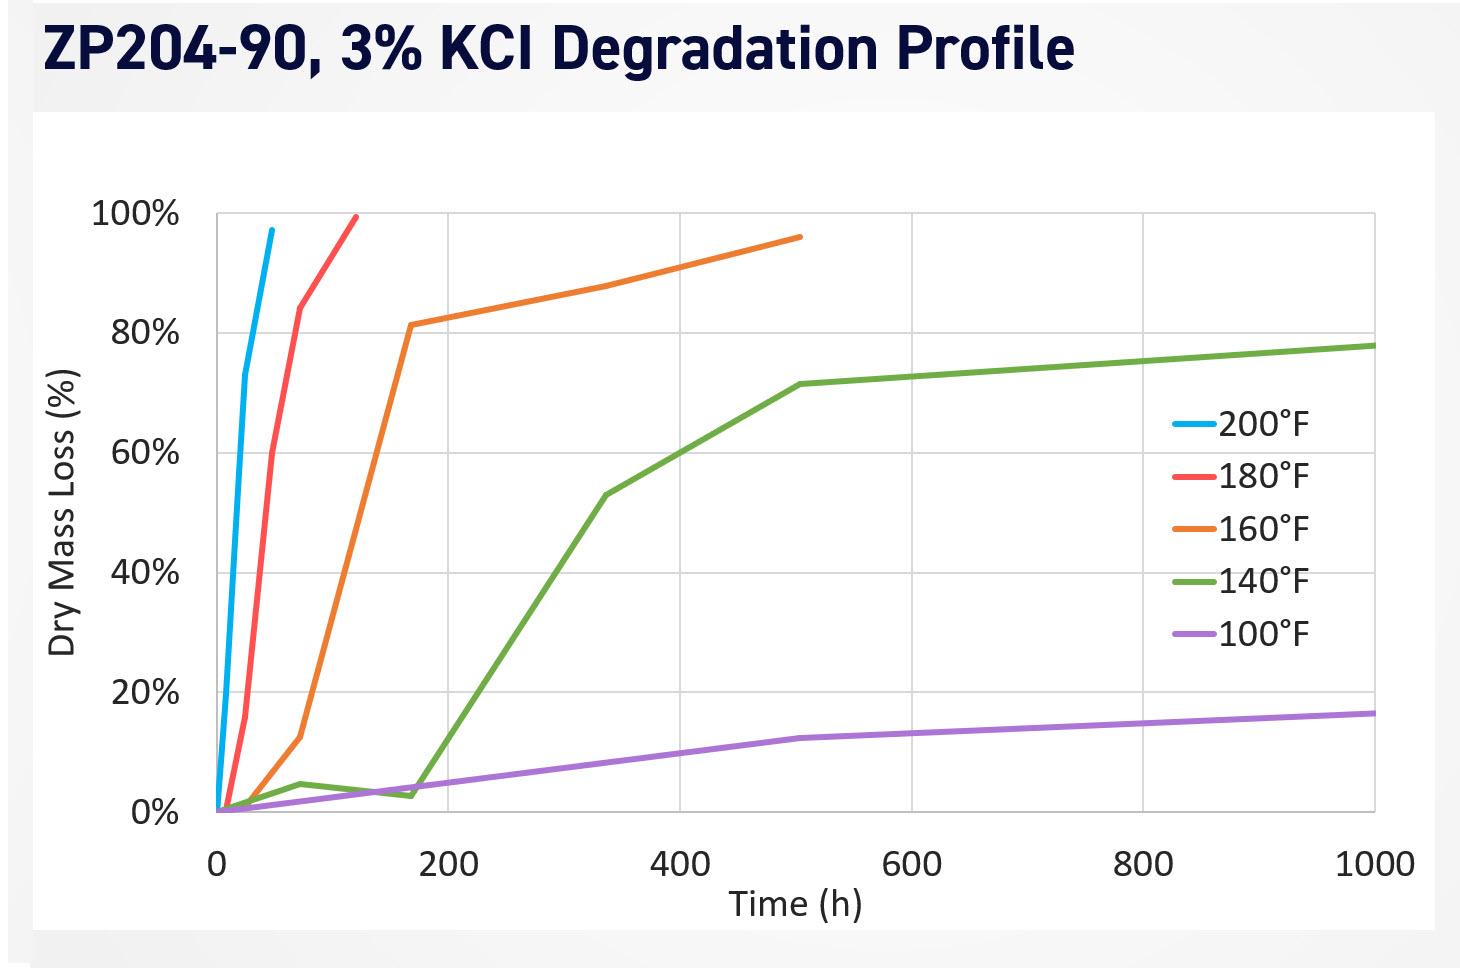 Parker ZP204-90 Degradation Profile in 3% KCl